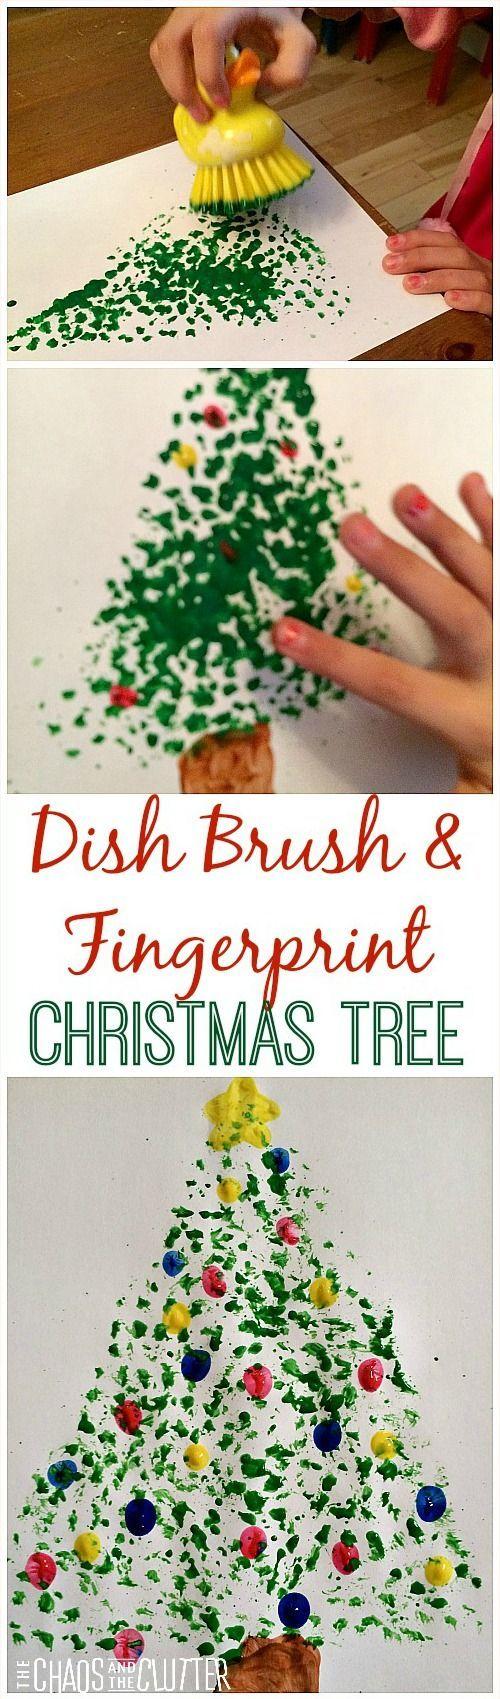 Dish Brush and Fingerprint Painted Christmas Tree - so cute!